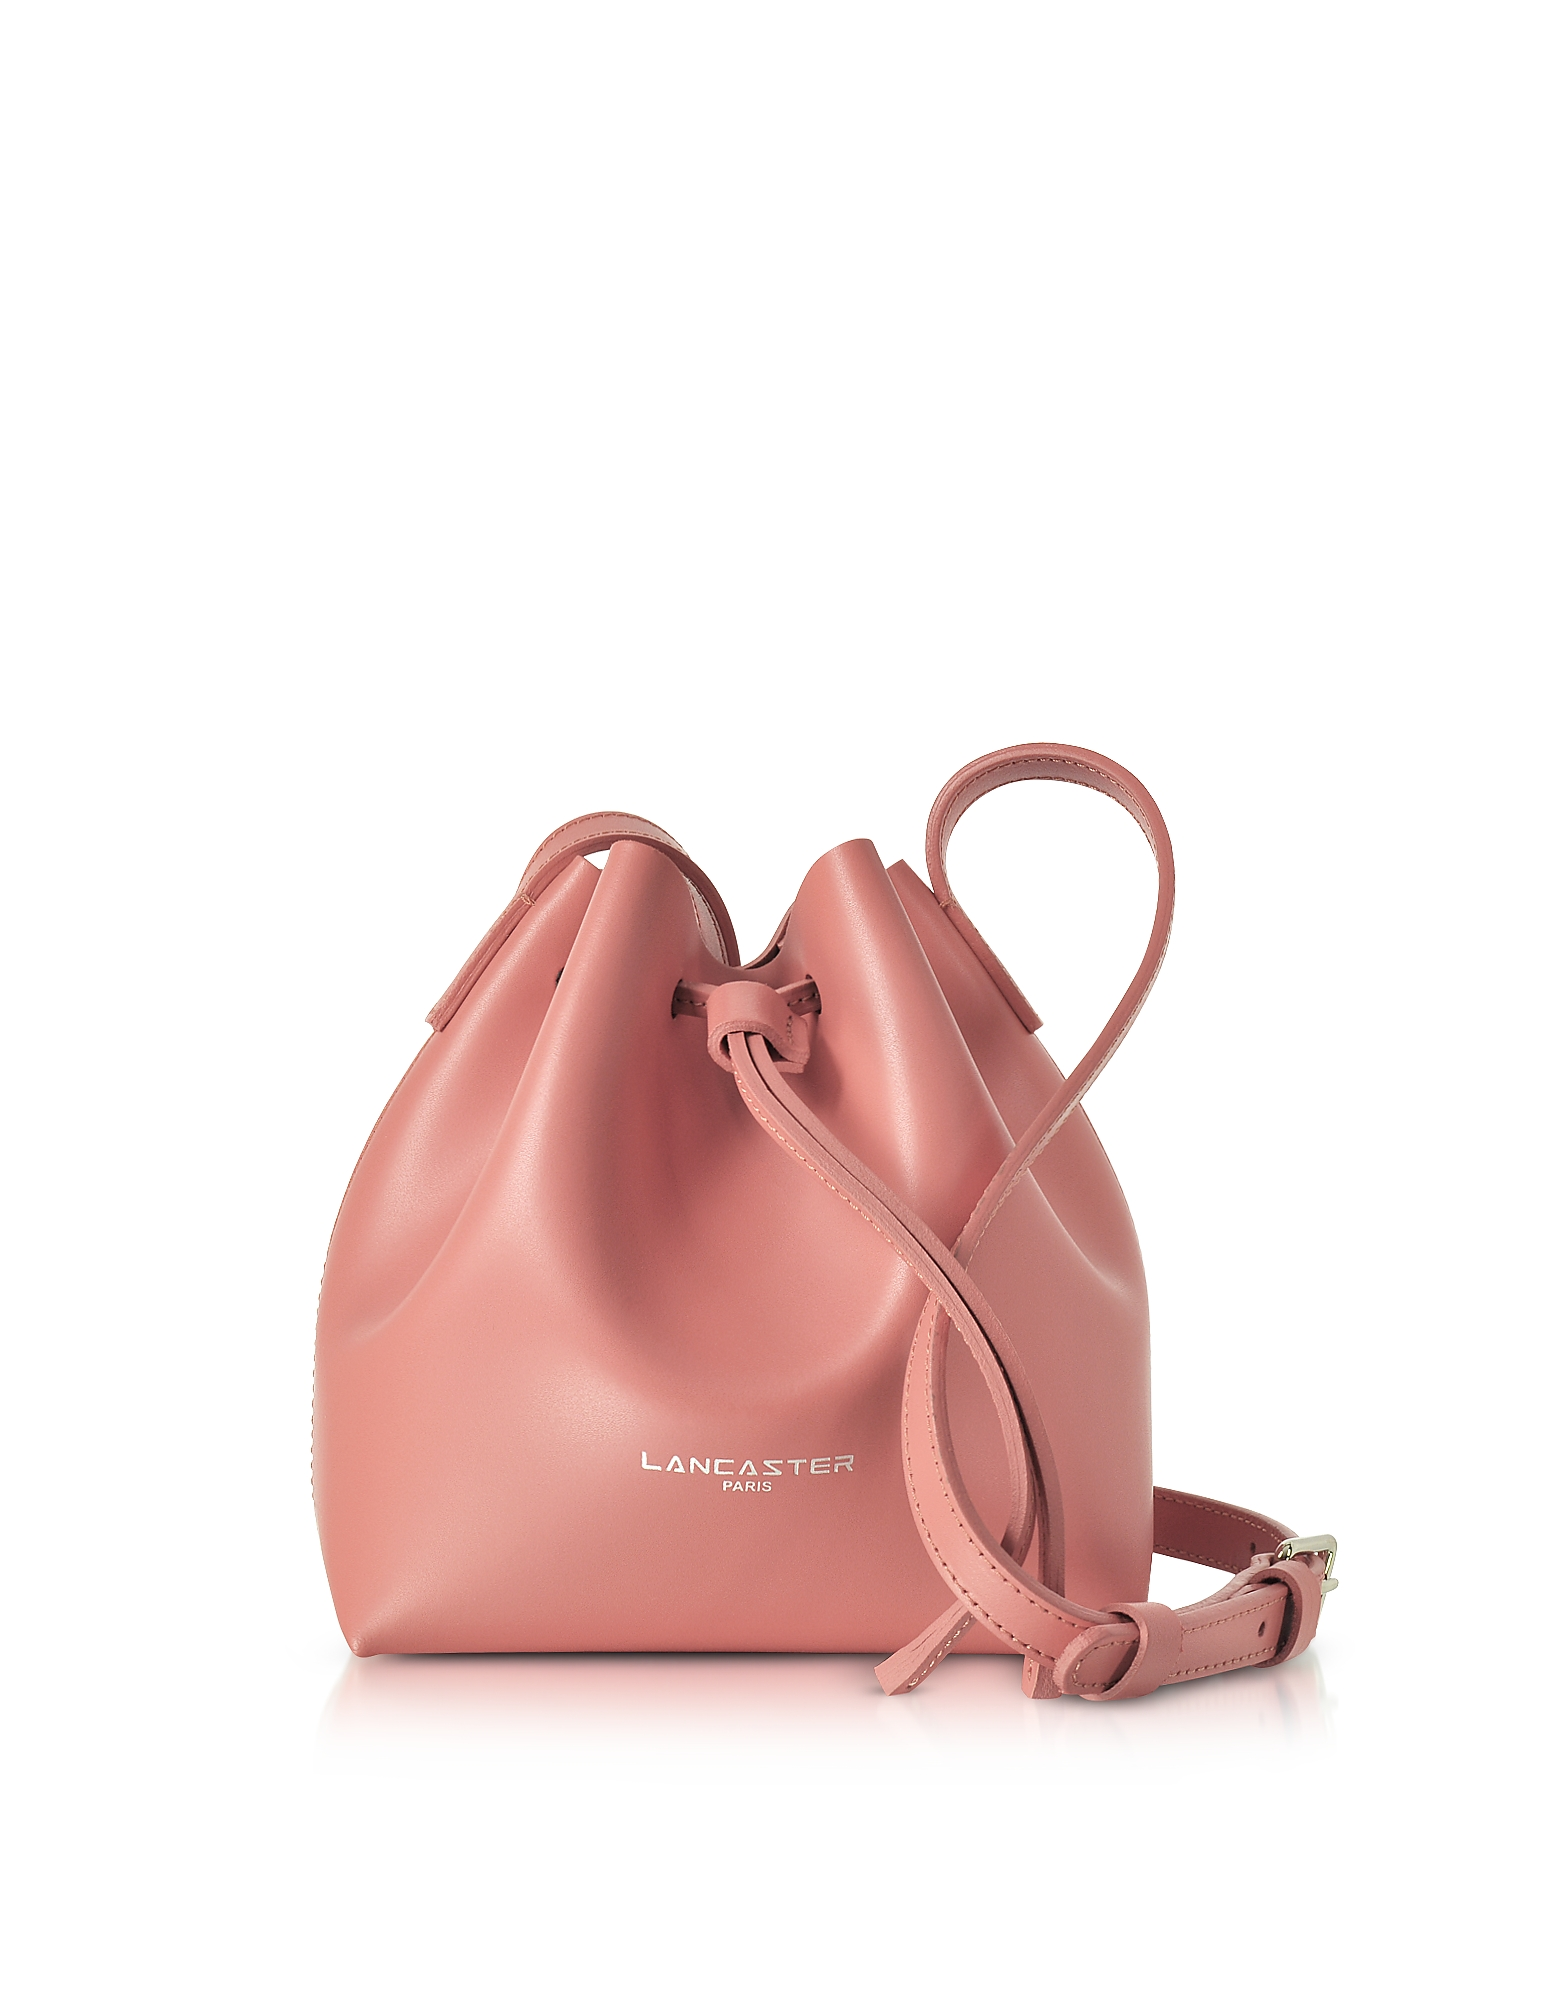 Lancaster Paris Handbags, Pur & Element Smooth Leather Mini Bucket Bag